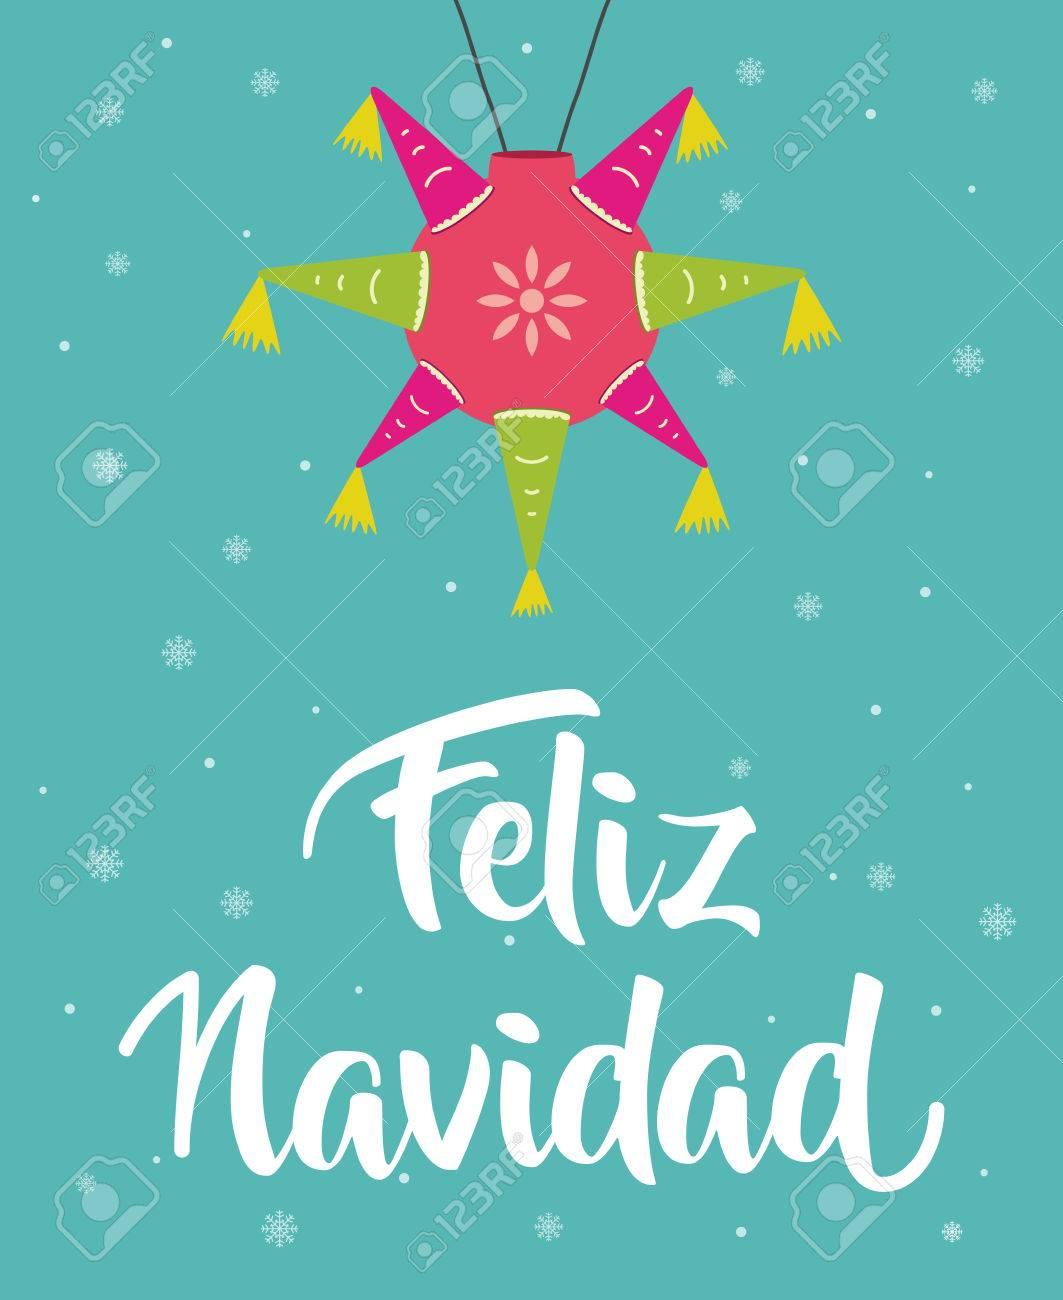 Buon Natale In Spagnolo.Vettoriale Feliz Navidad Buon Natale In Spagnolo Con Pinata Image 74190225